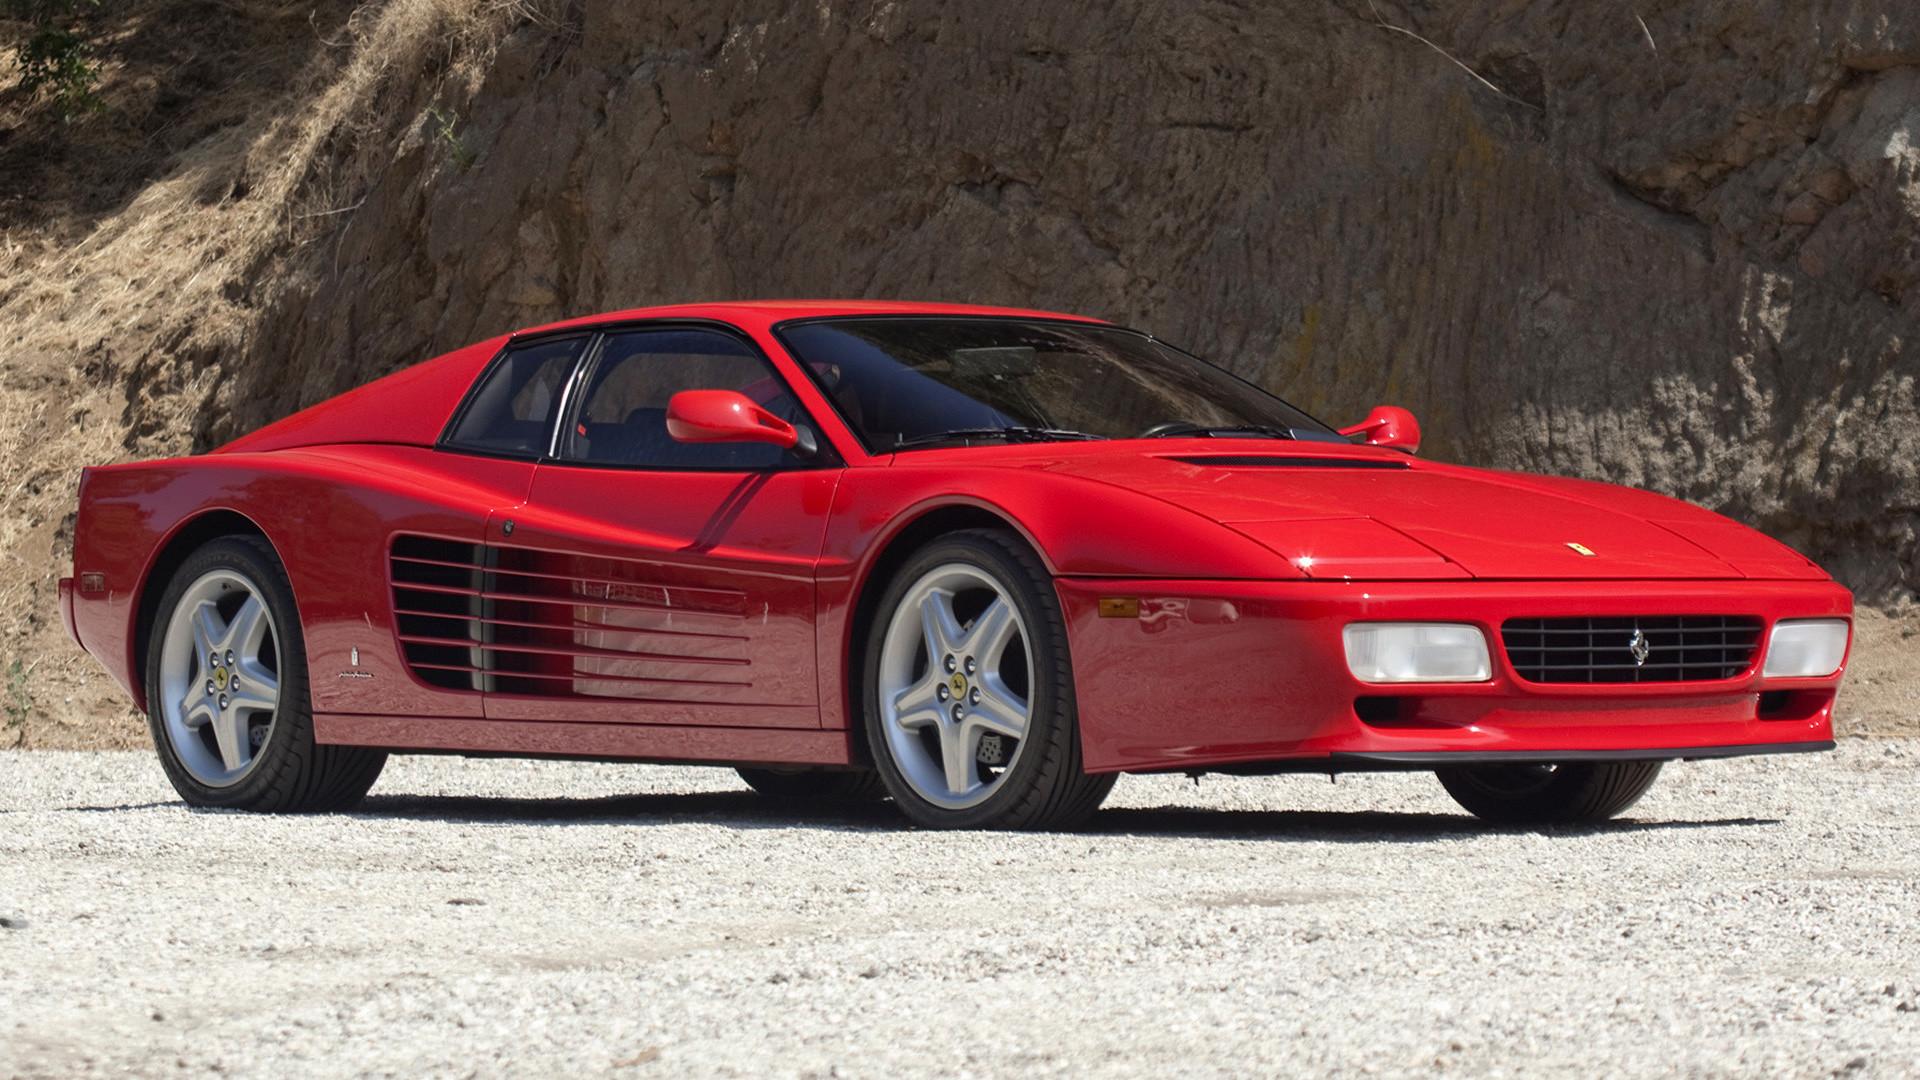 Ferrari 512 Tr A Sublime Model Born From An Evolution Of The Amazing Ferrari Testarossa